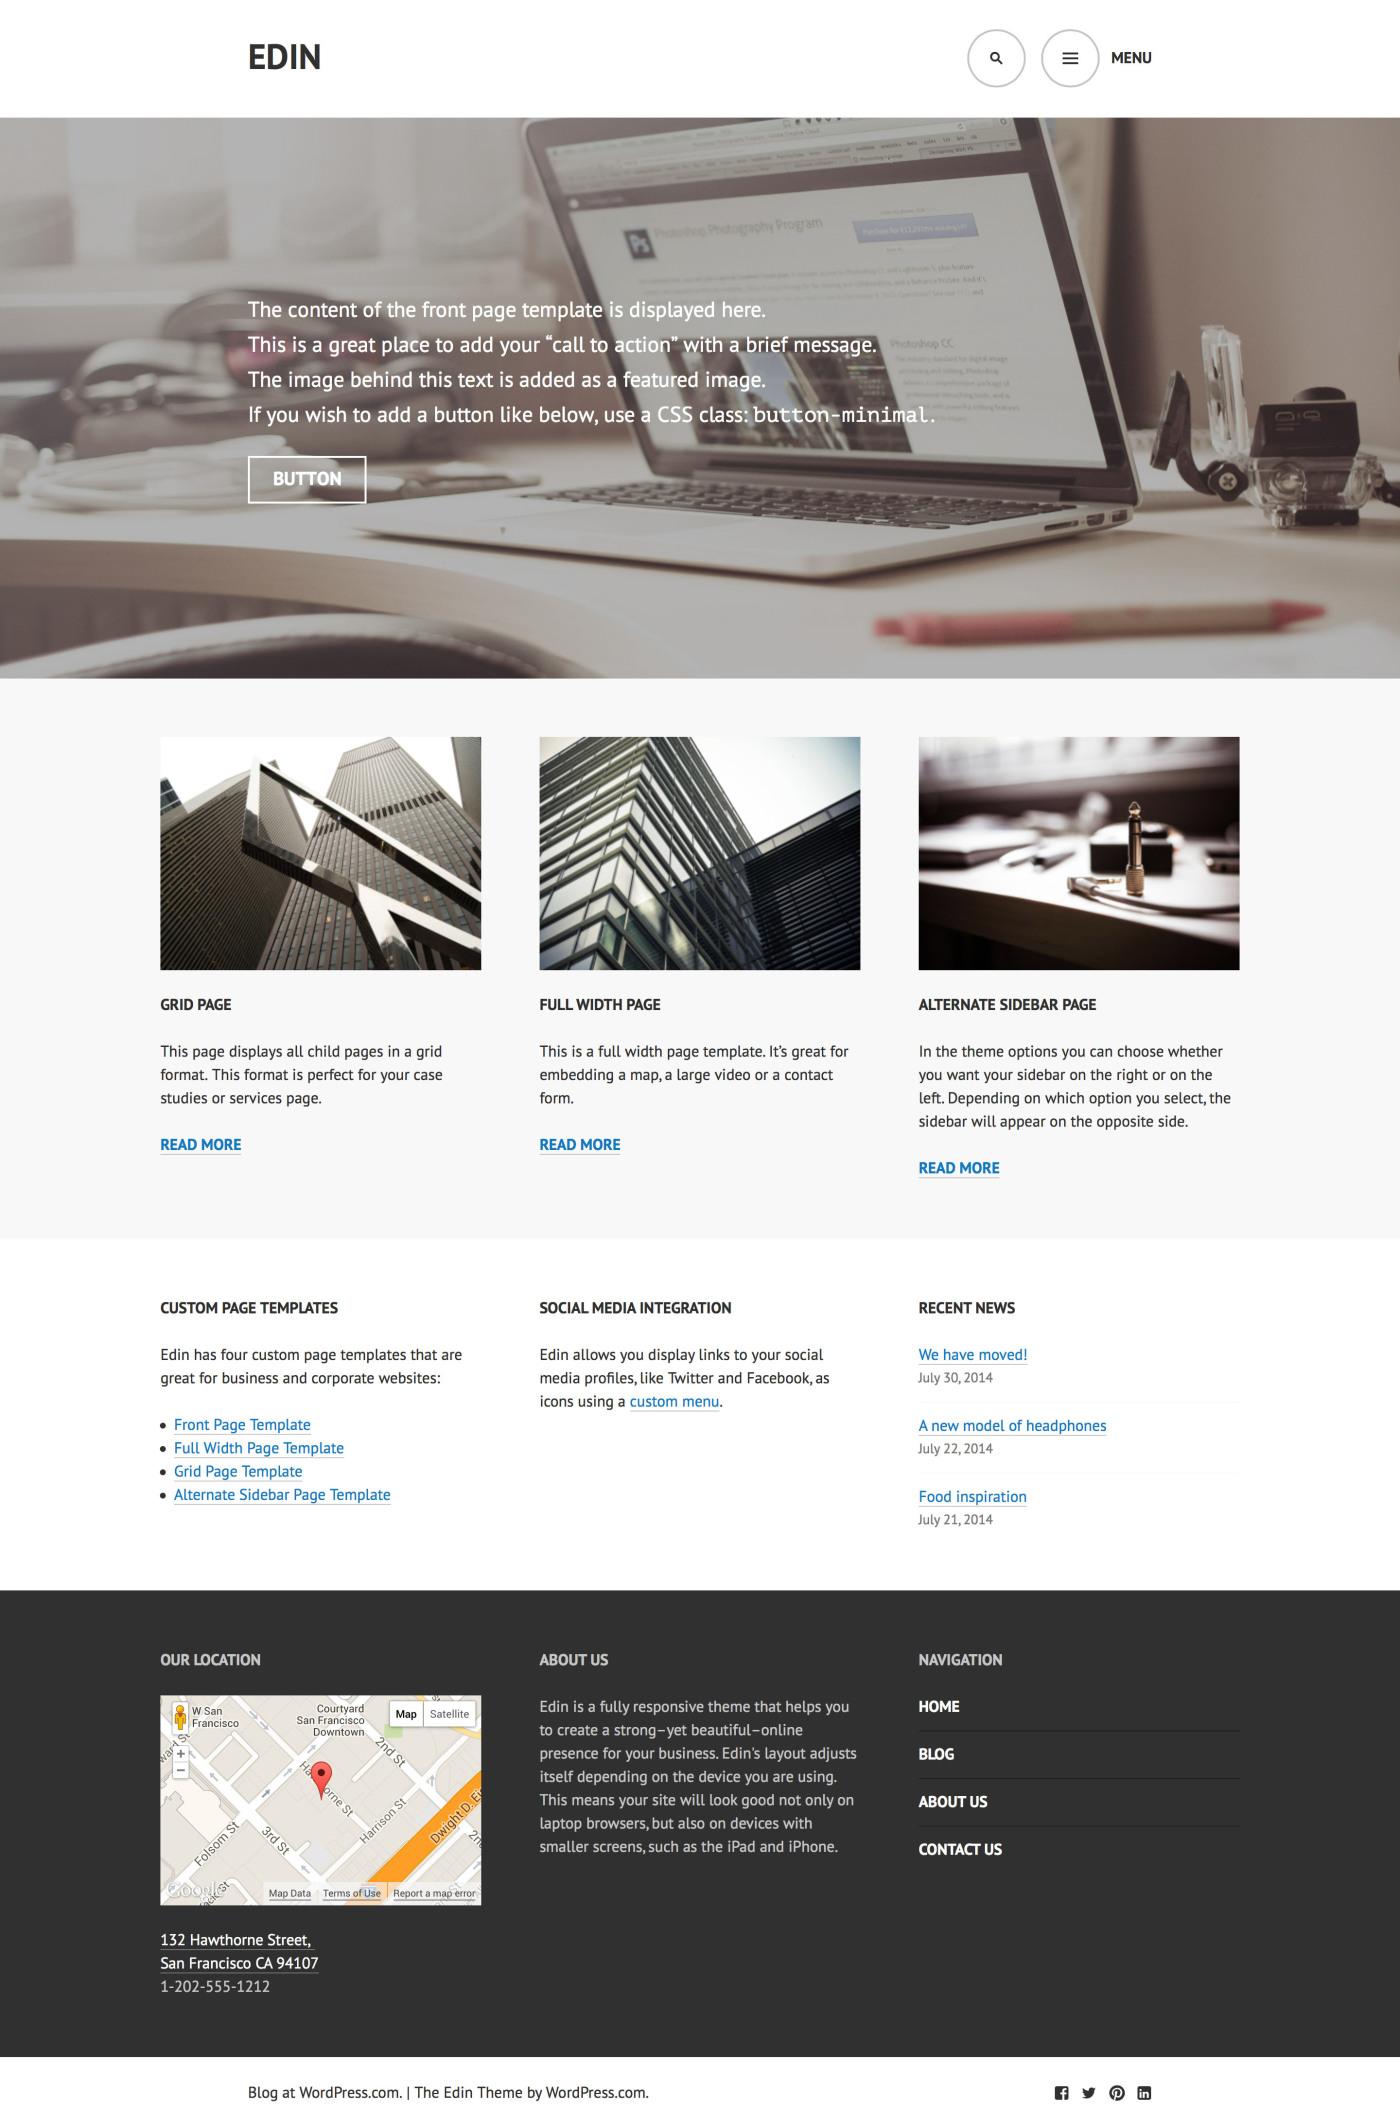 Edin: A Beautiful Free Business Theme for WordPress – WordPress Tavern